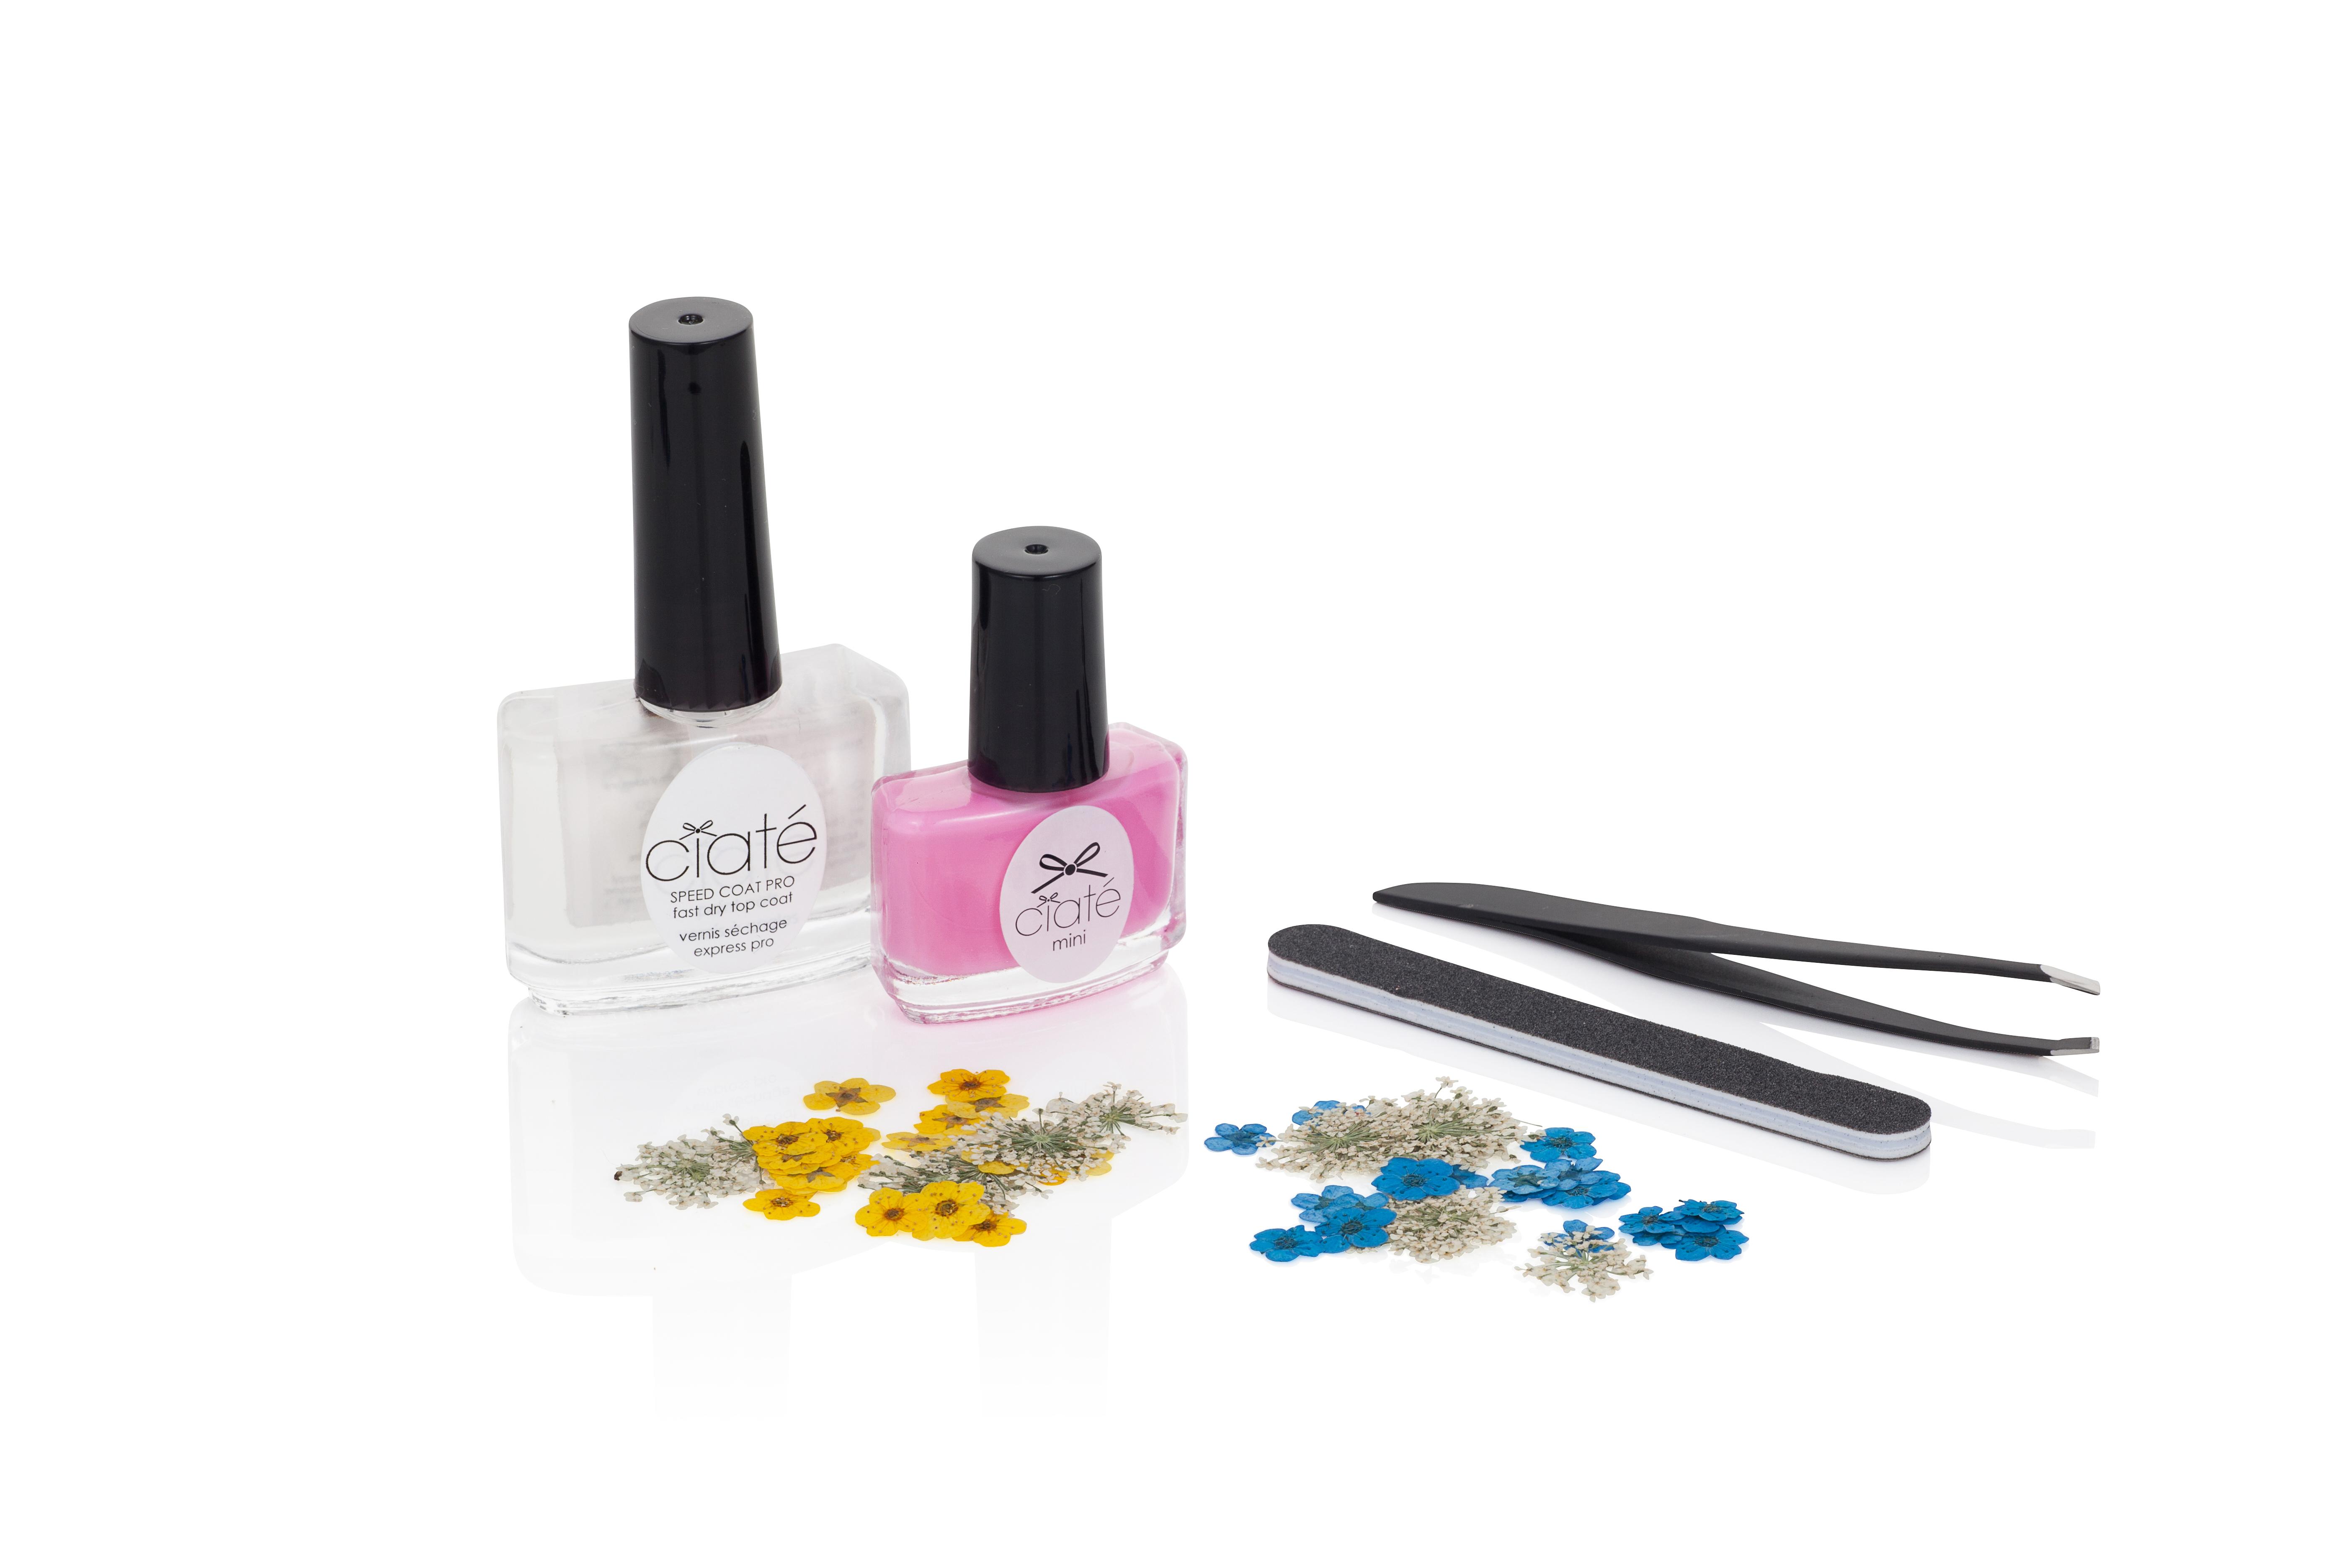 Ciate_Flower_Manicure_Strike_a_Posy_Productshot